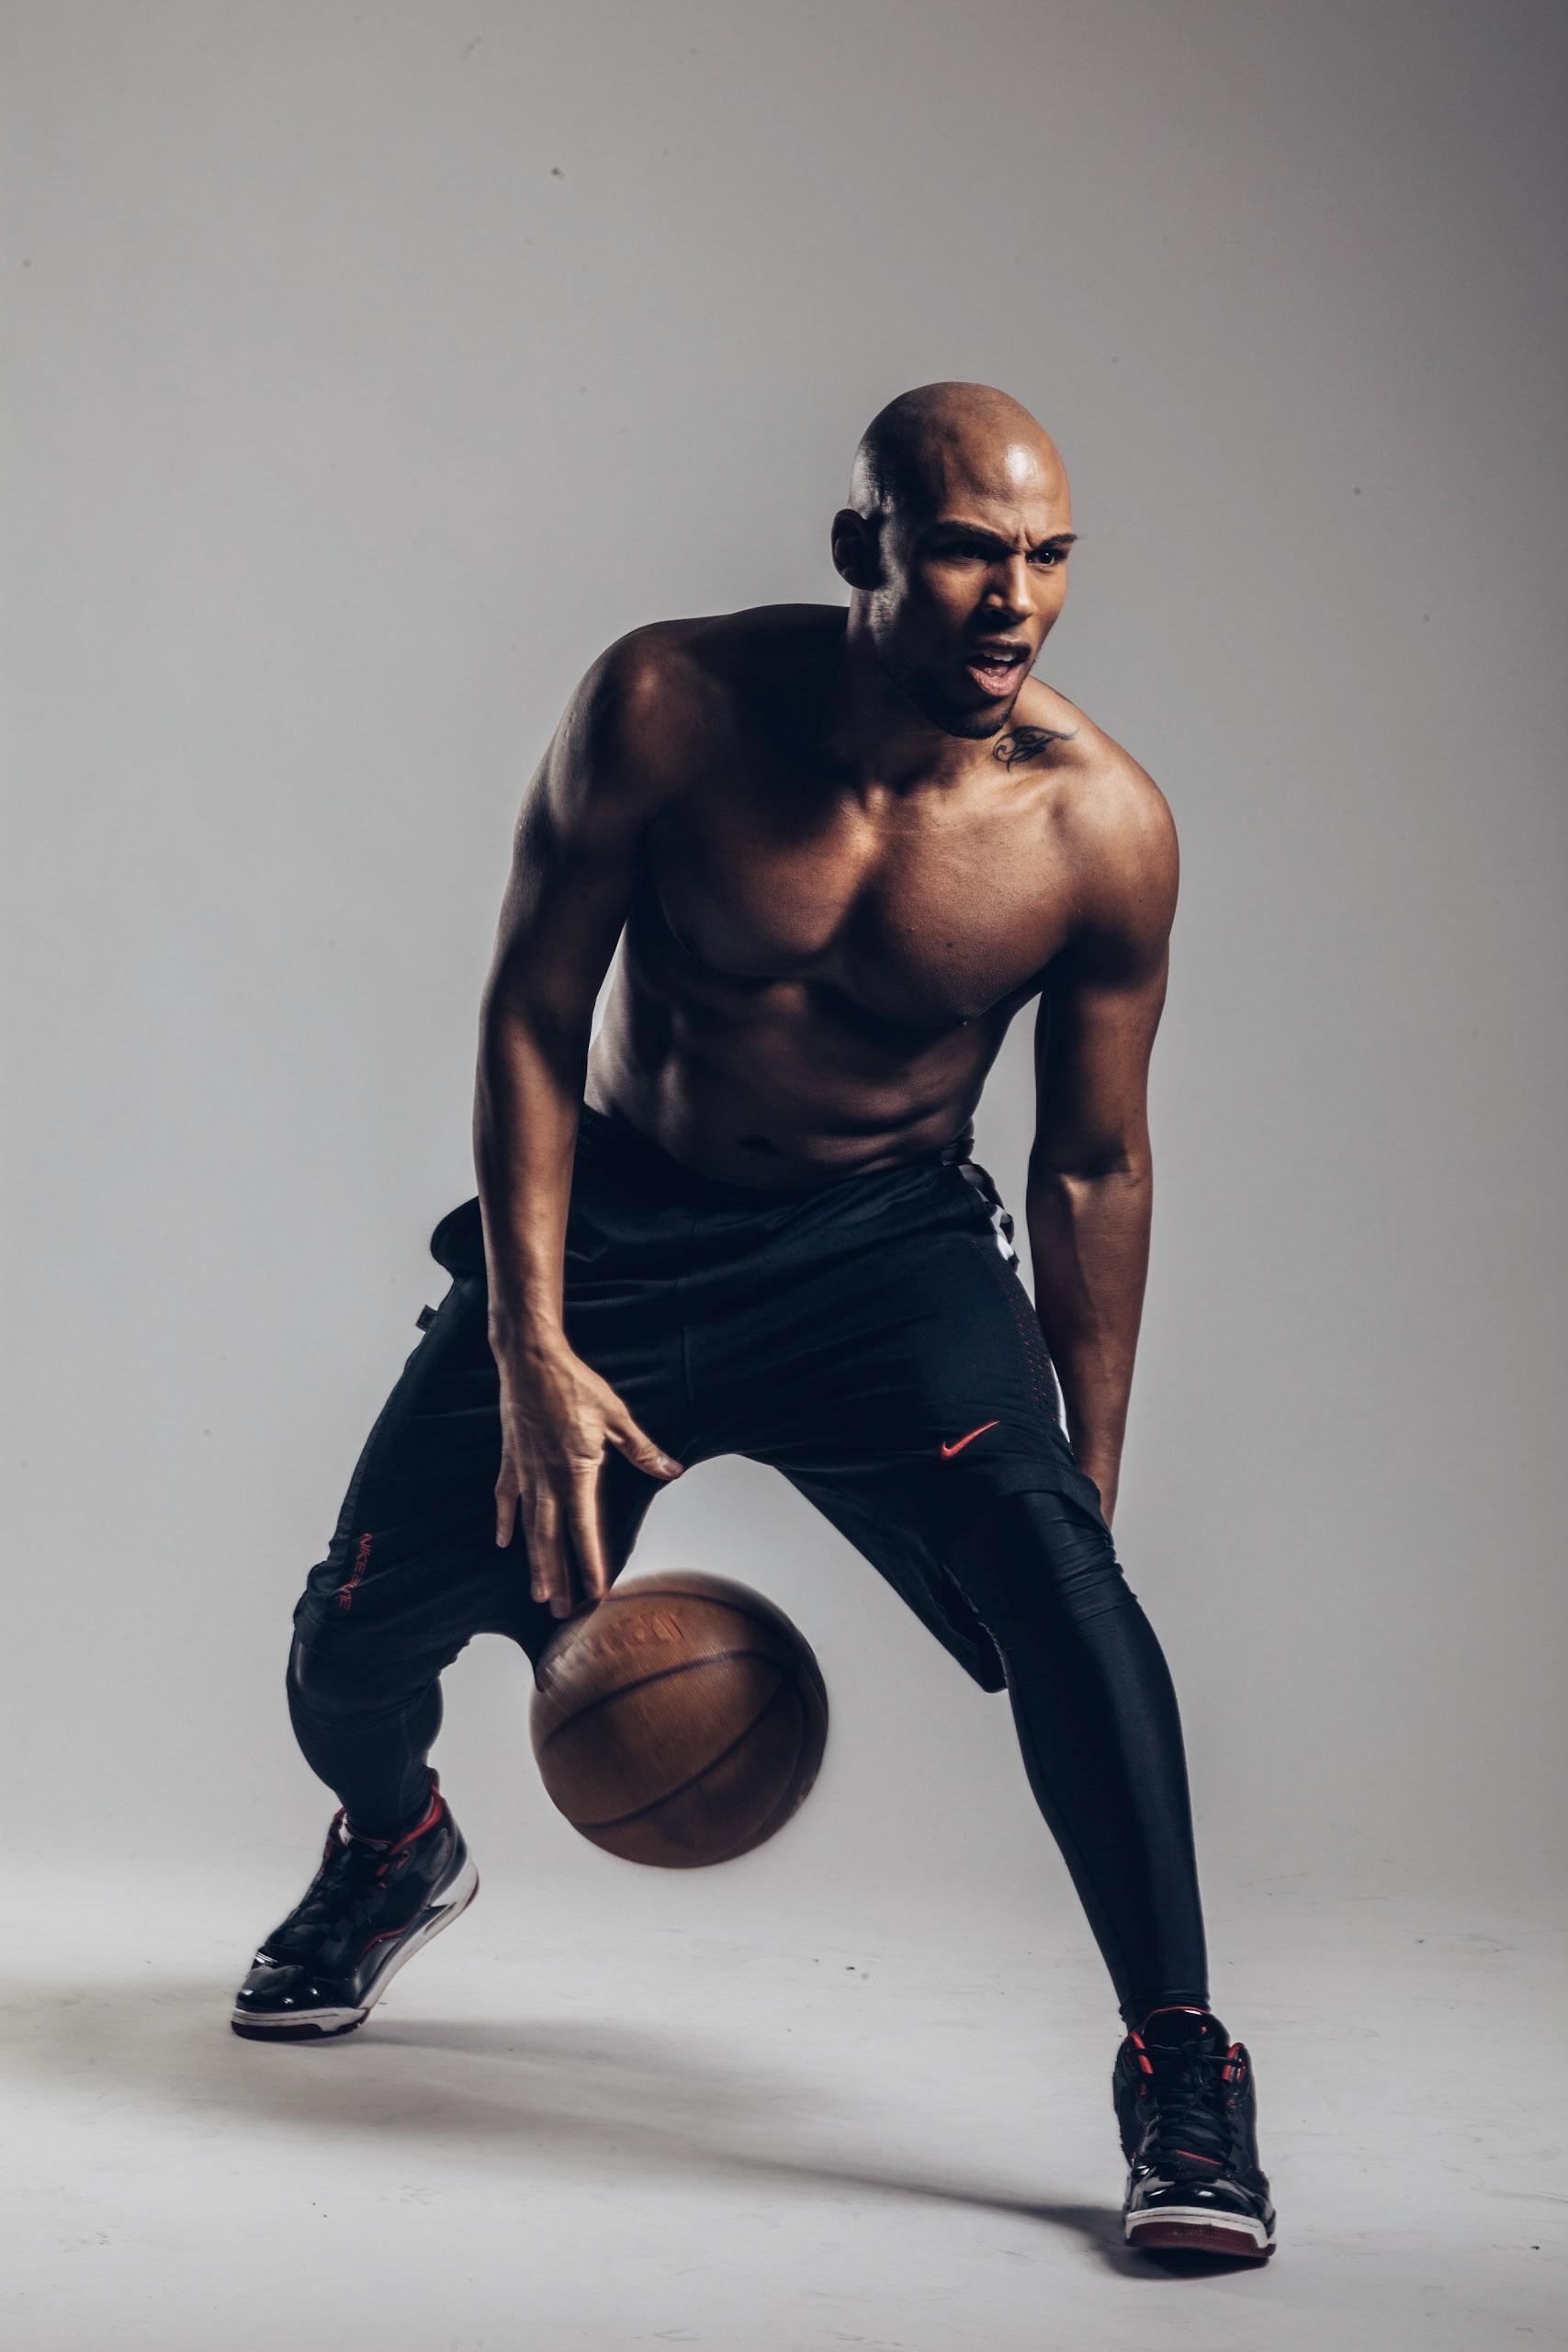 Florian Silmont @Sport Models